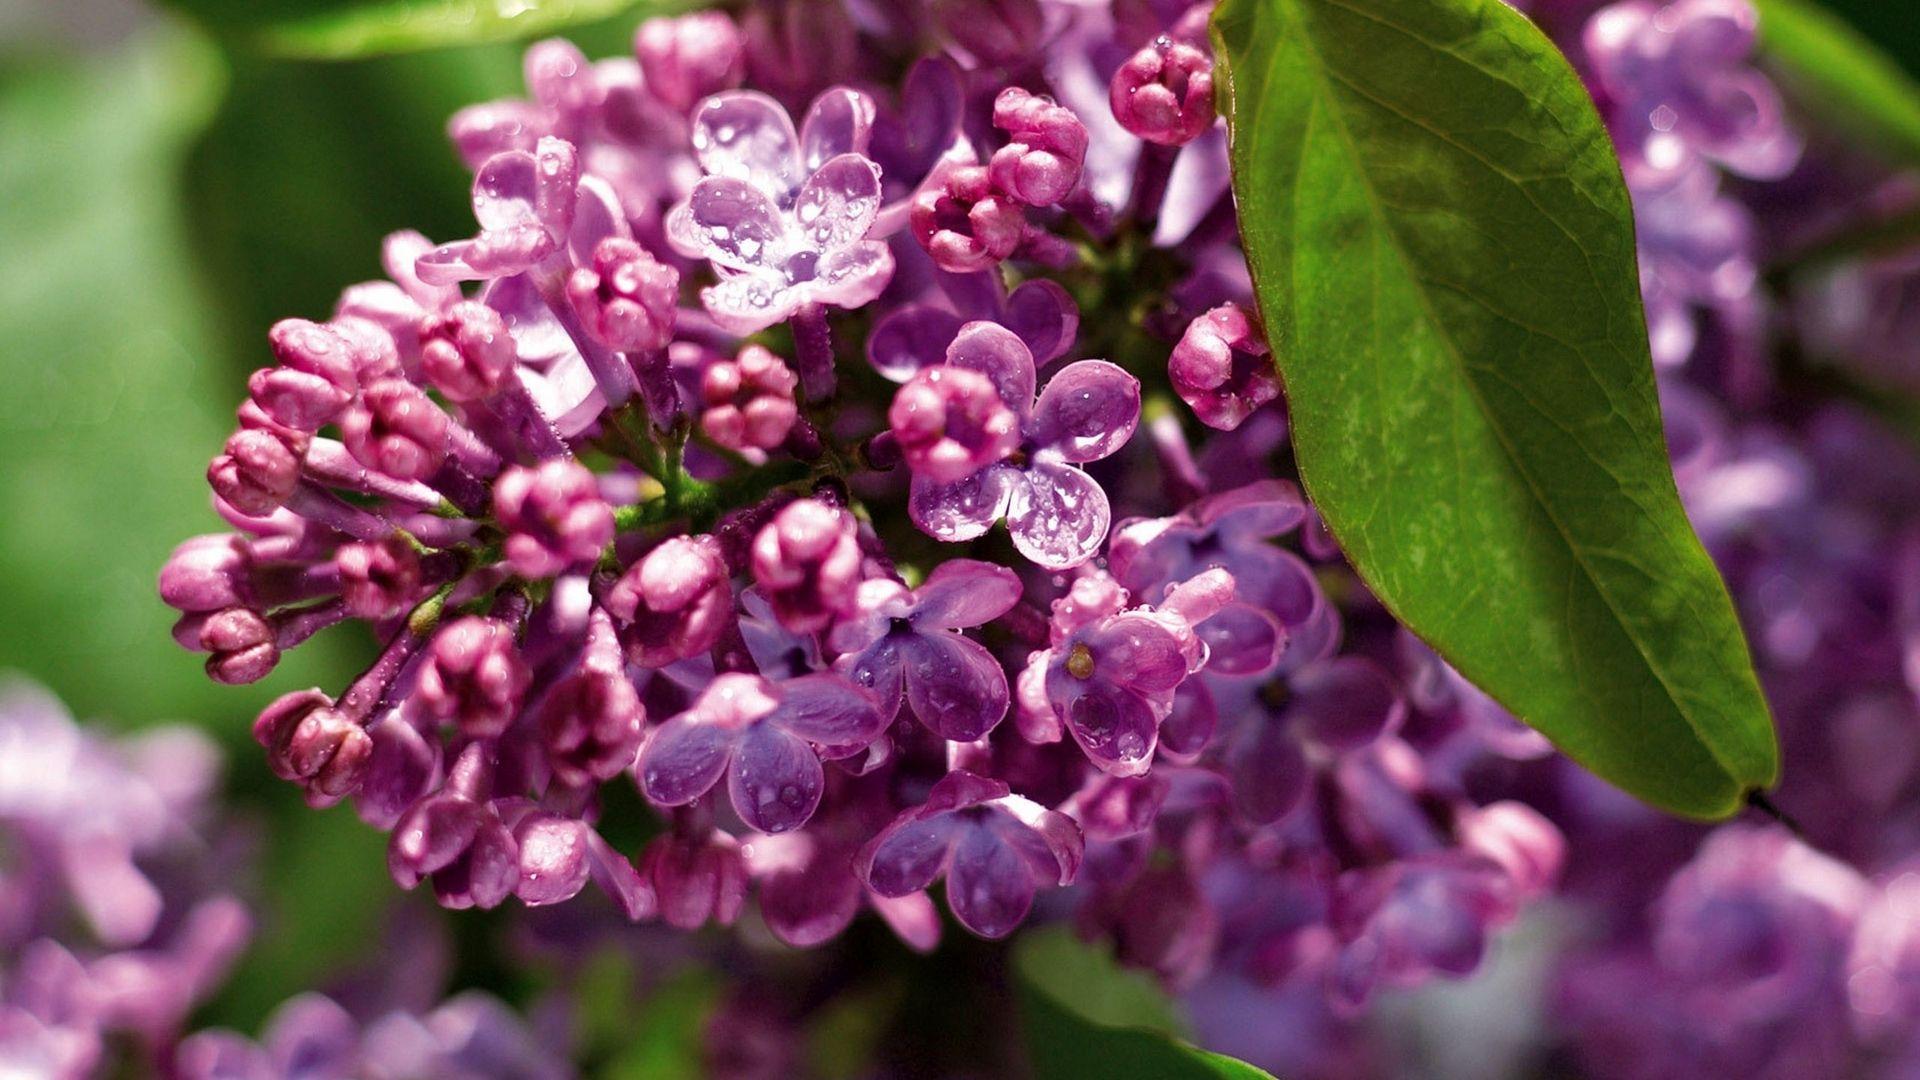 Lilac desktop wallpaper download